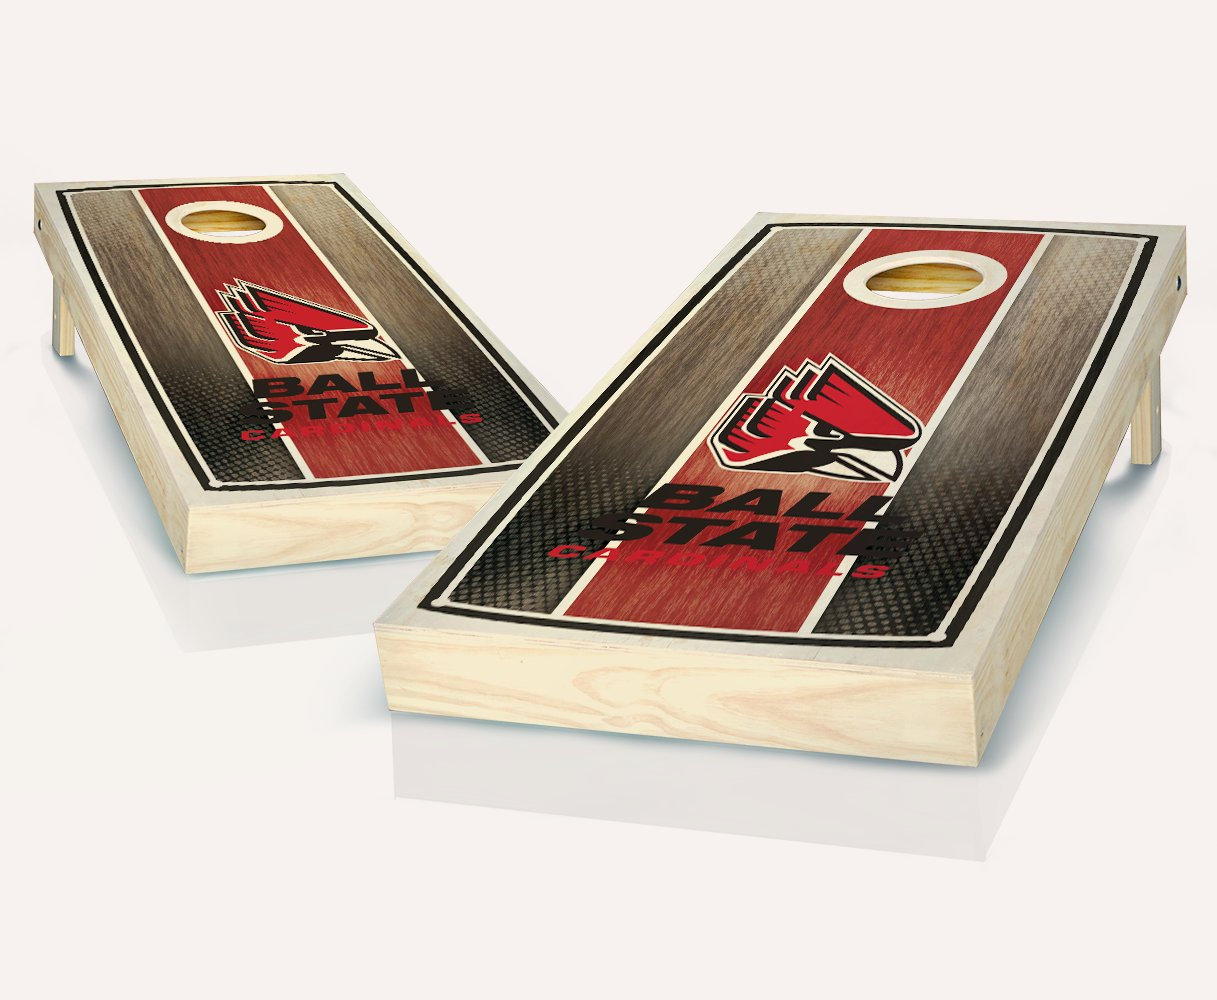 Ball State Cardinals StainedストライプカスタムCornholeボードregulation sizeゲームセットBaggo Bean Bag Toss + 8 ACA Regulation Bags B07CS74NY3